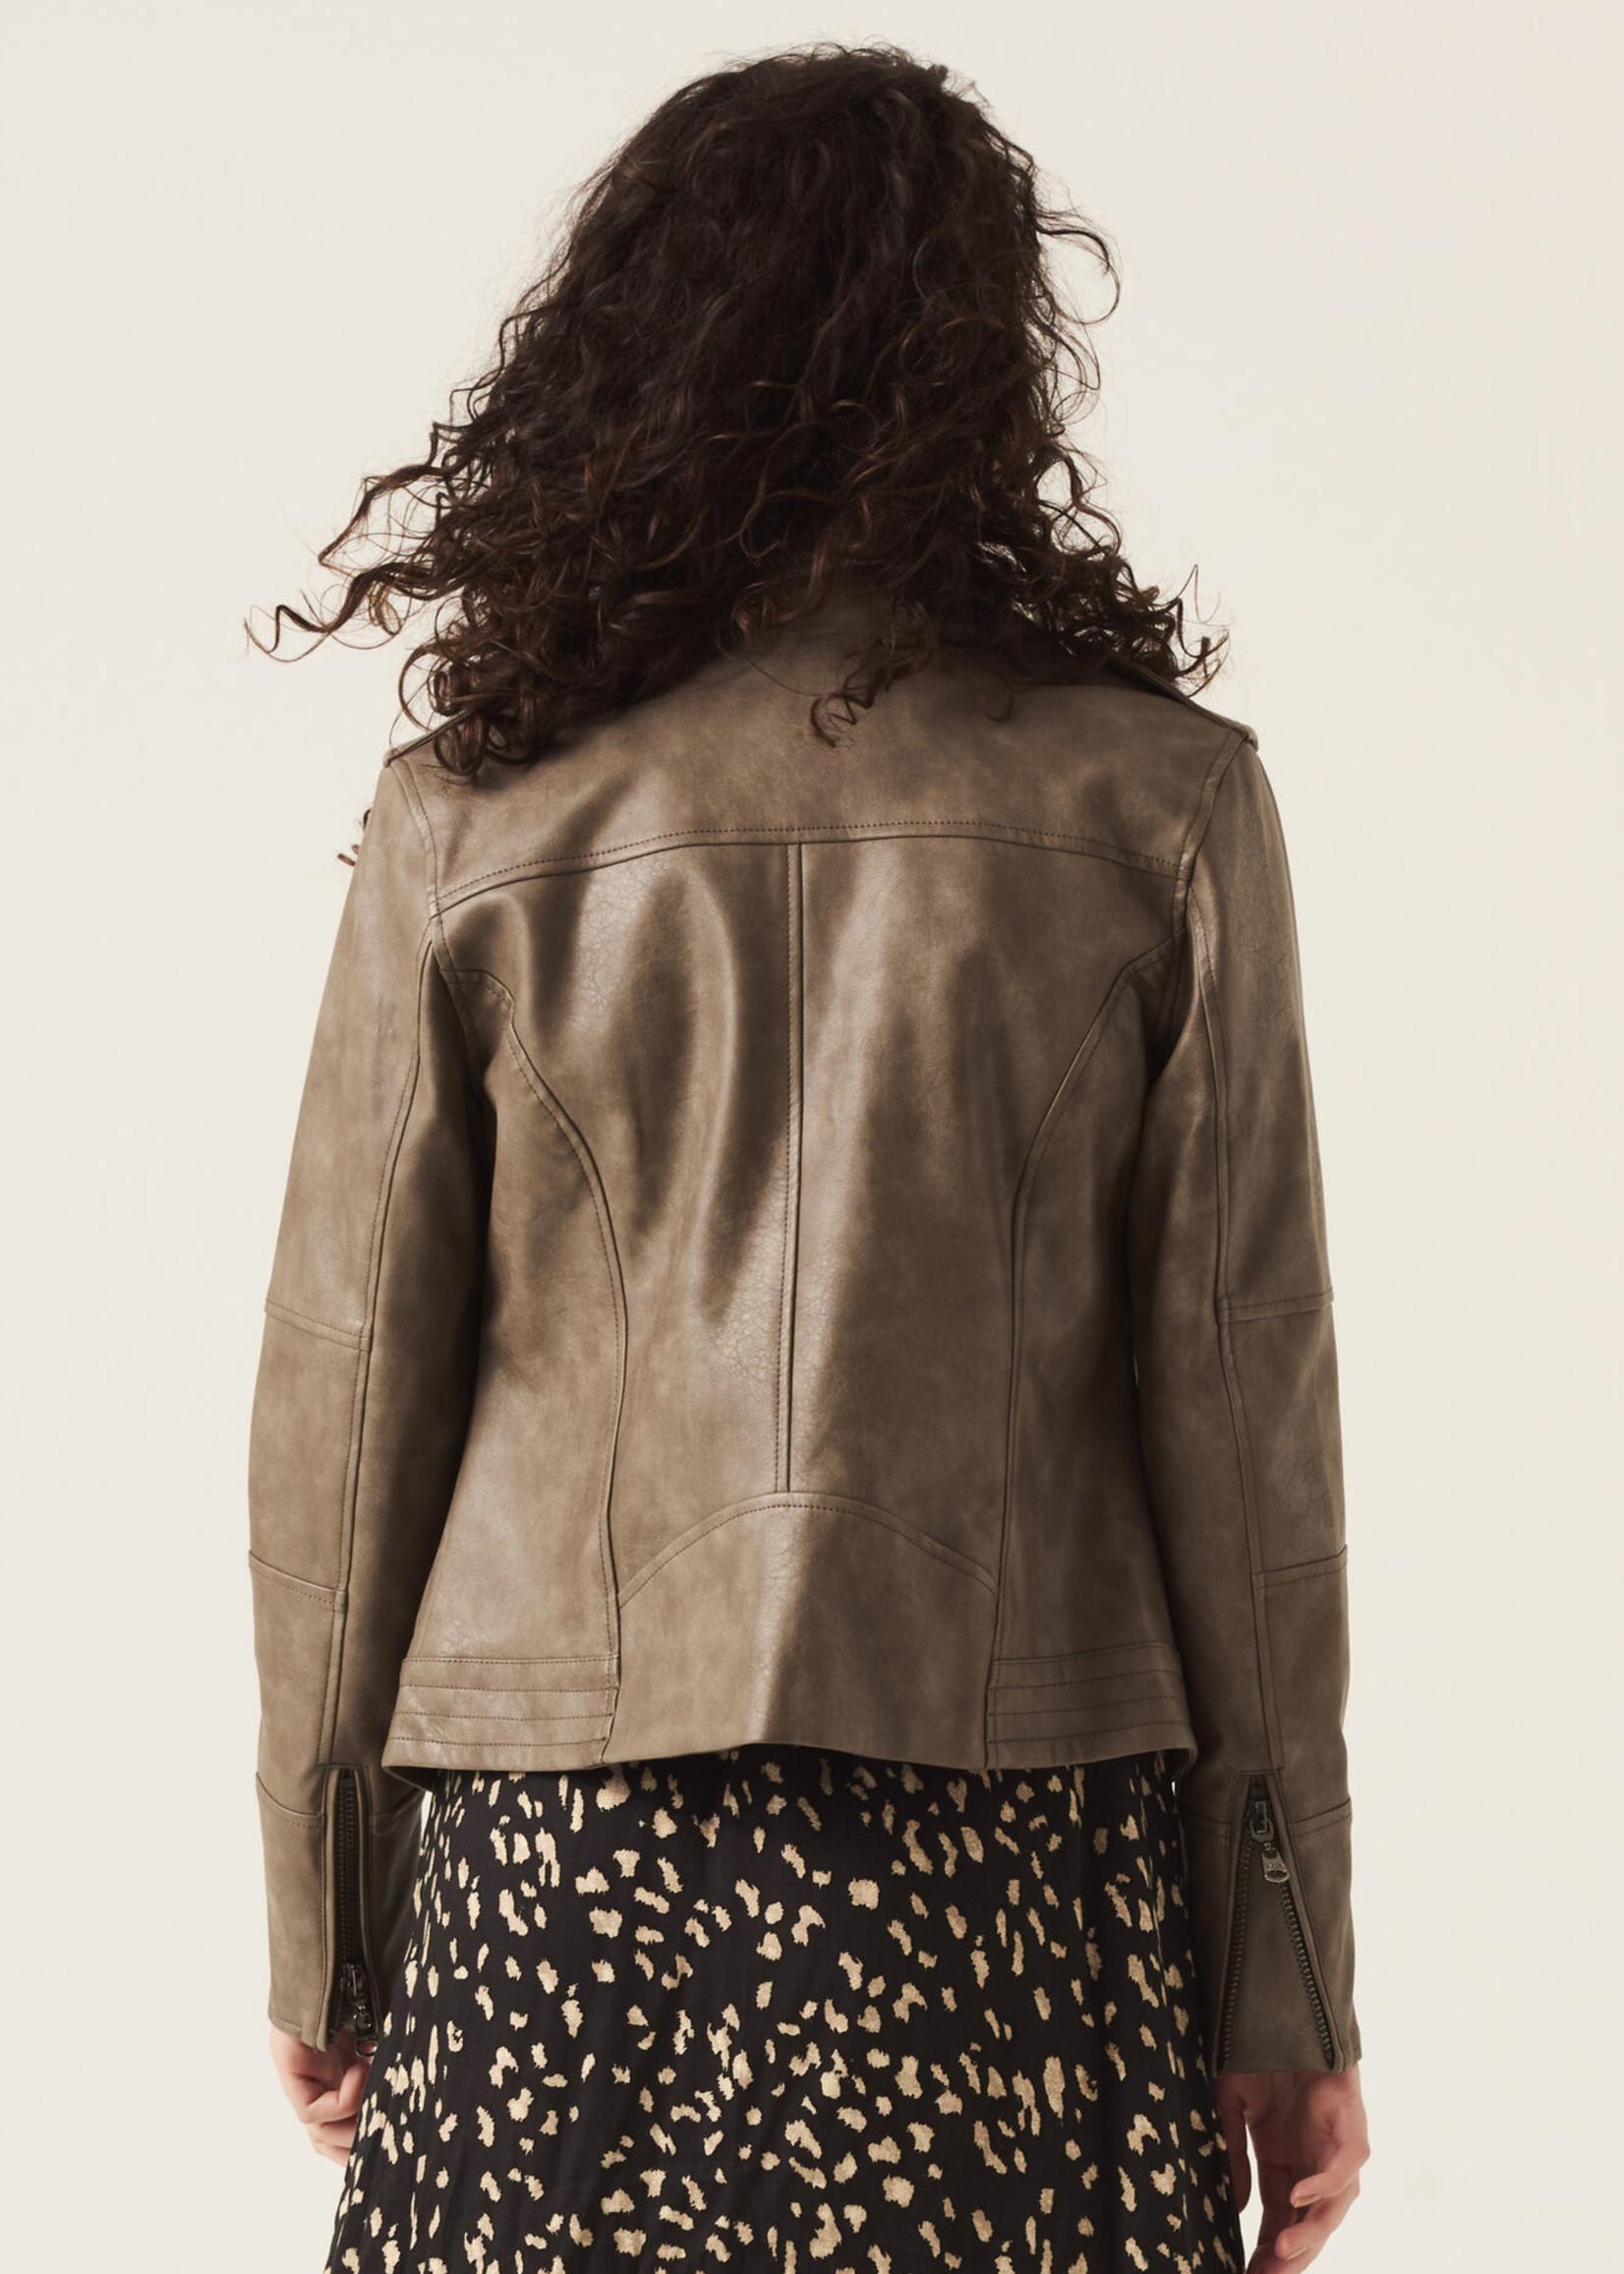 Garcia Garcia Grey Leather Look Moto Jacket